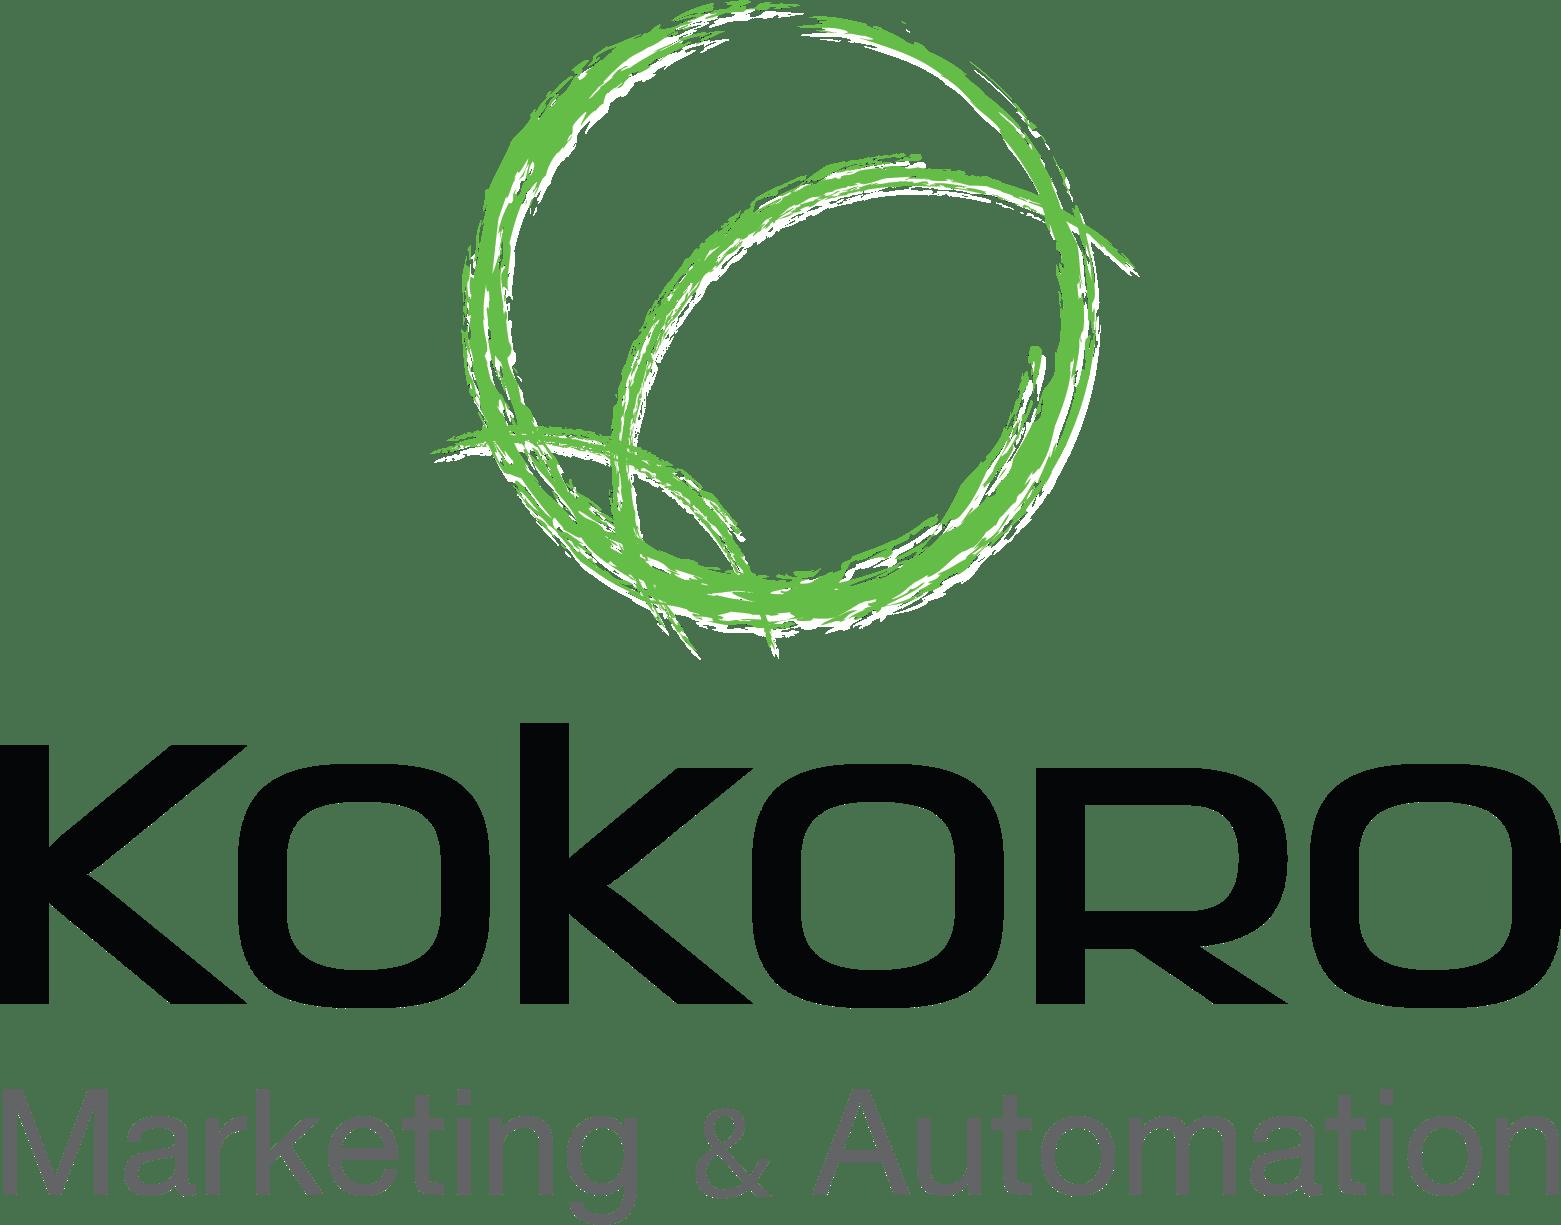 Kokoro Marketing